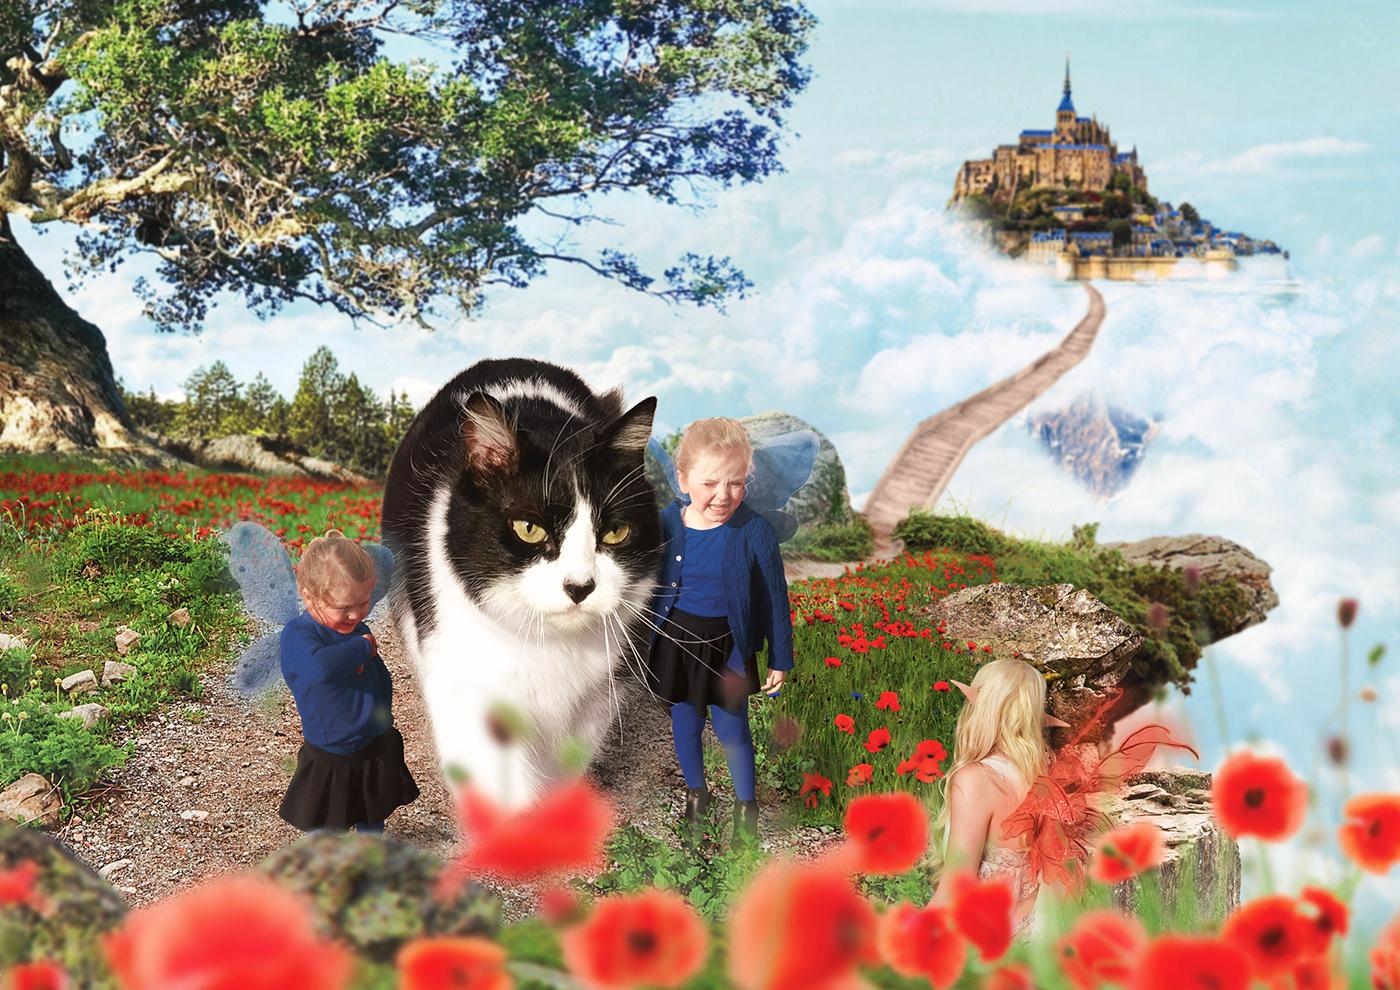 photoshop Photo Manipulation  retouching  Digital Art  fantasy faeries Cat floating islands concept art